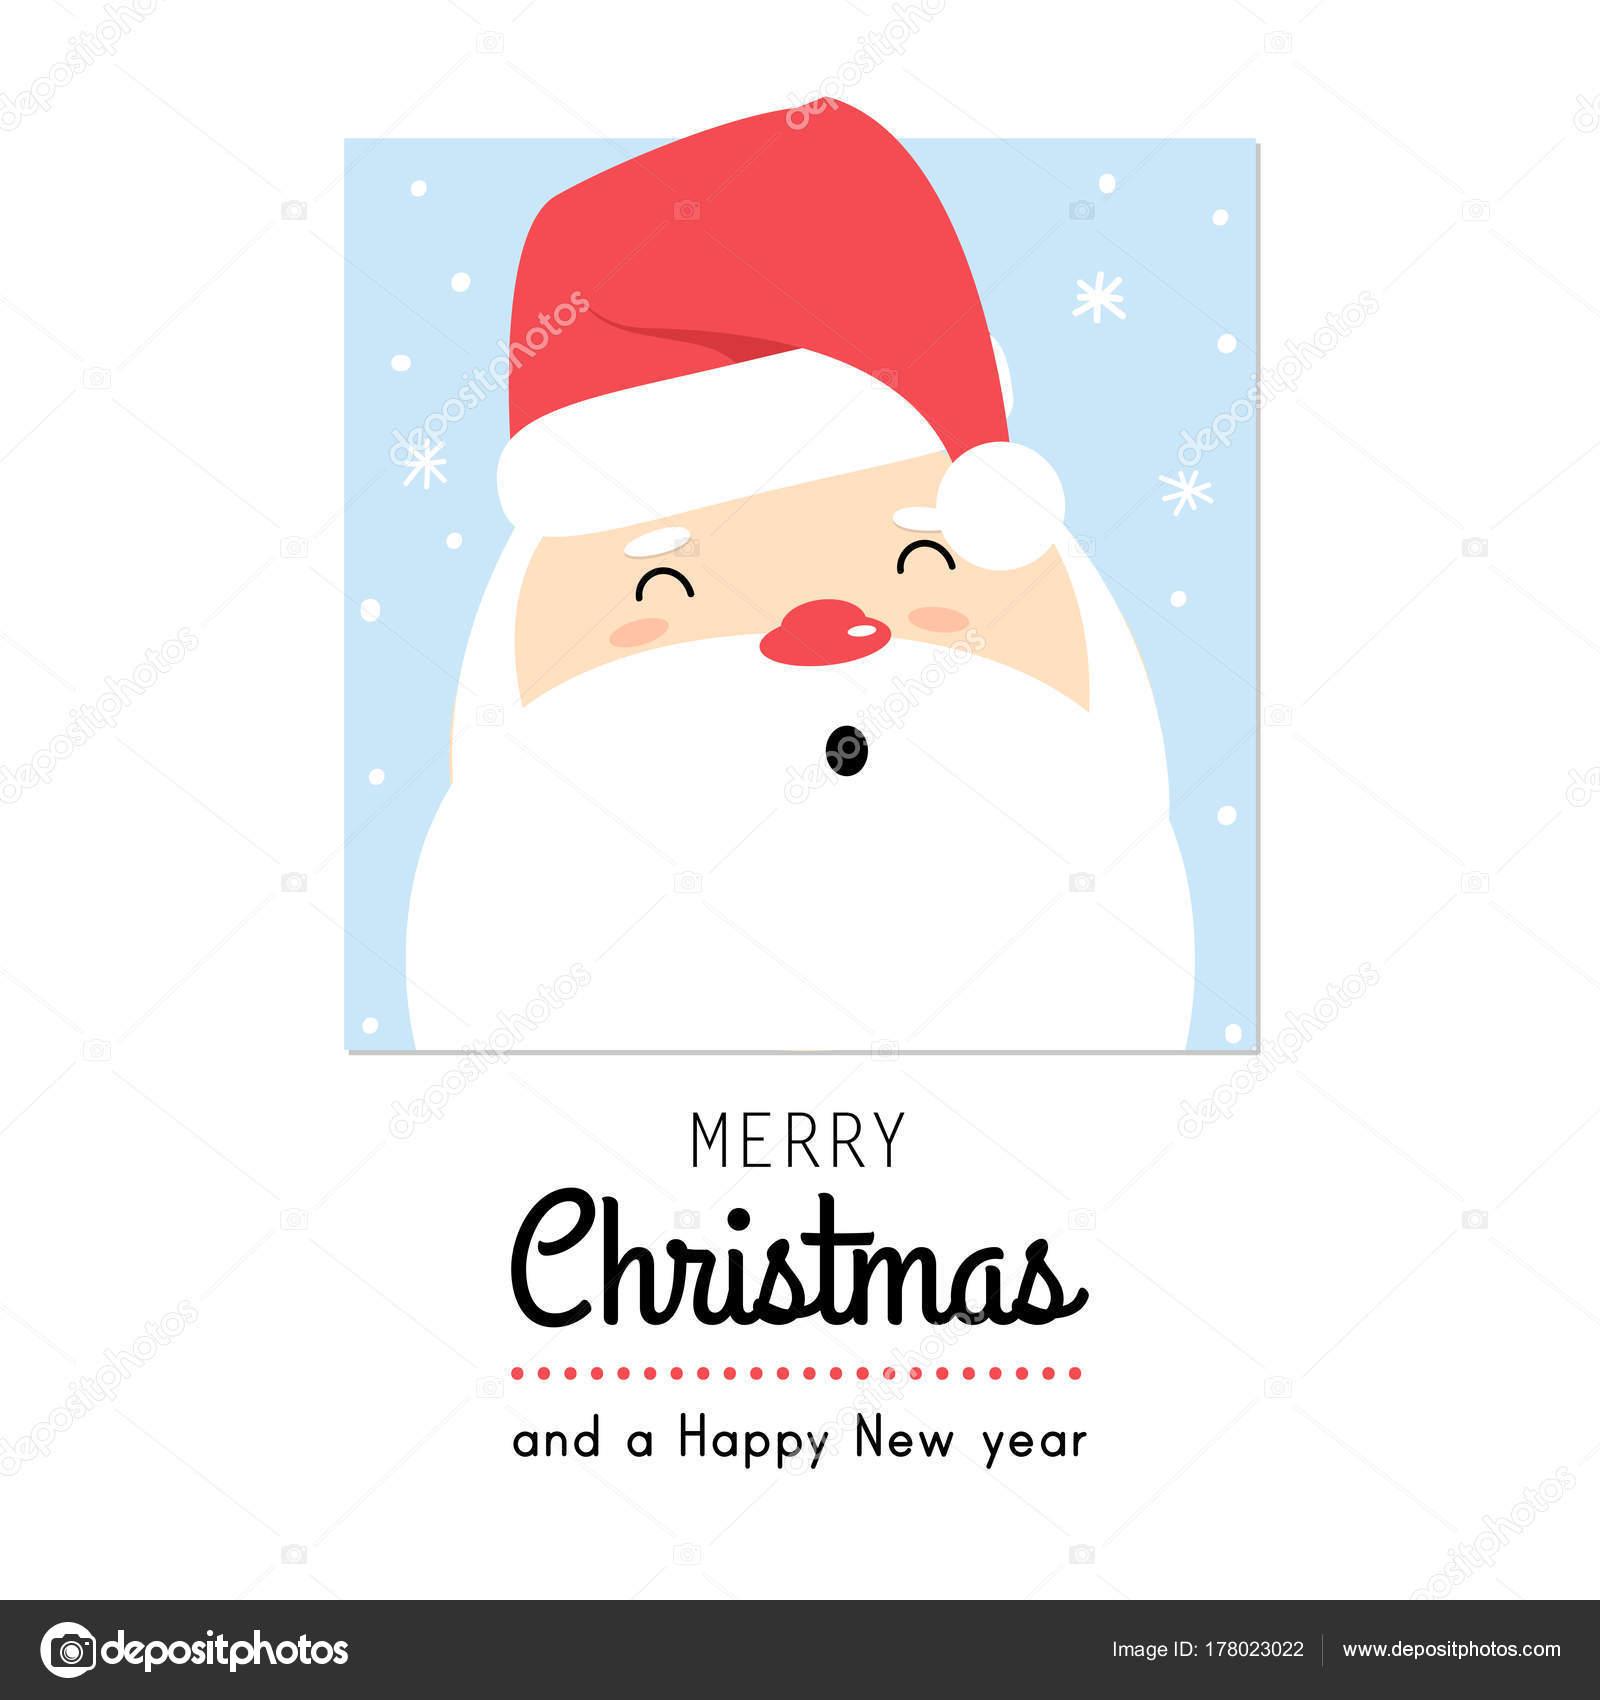 Süße Weihnachtsgrüße.Süße Weihnachtsgrüße Kartendesign Cartoon Santa Stockvektor